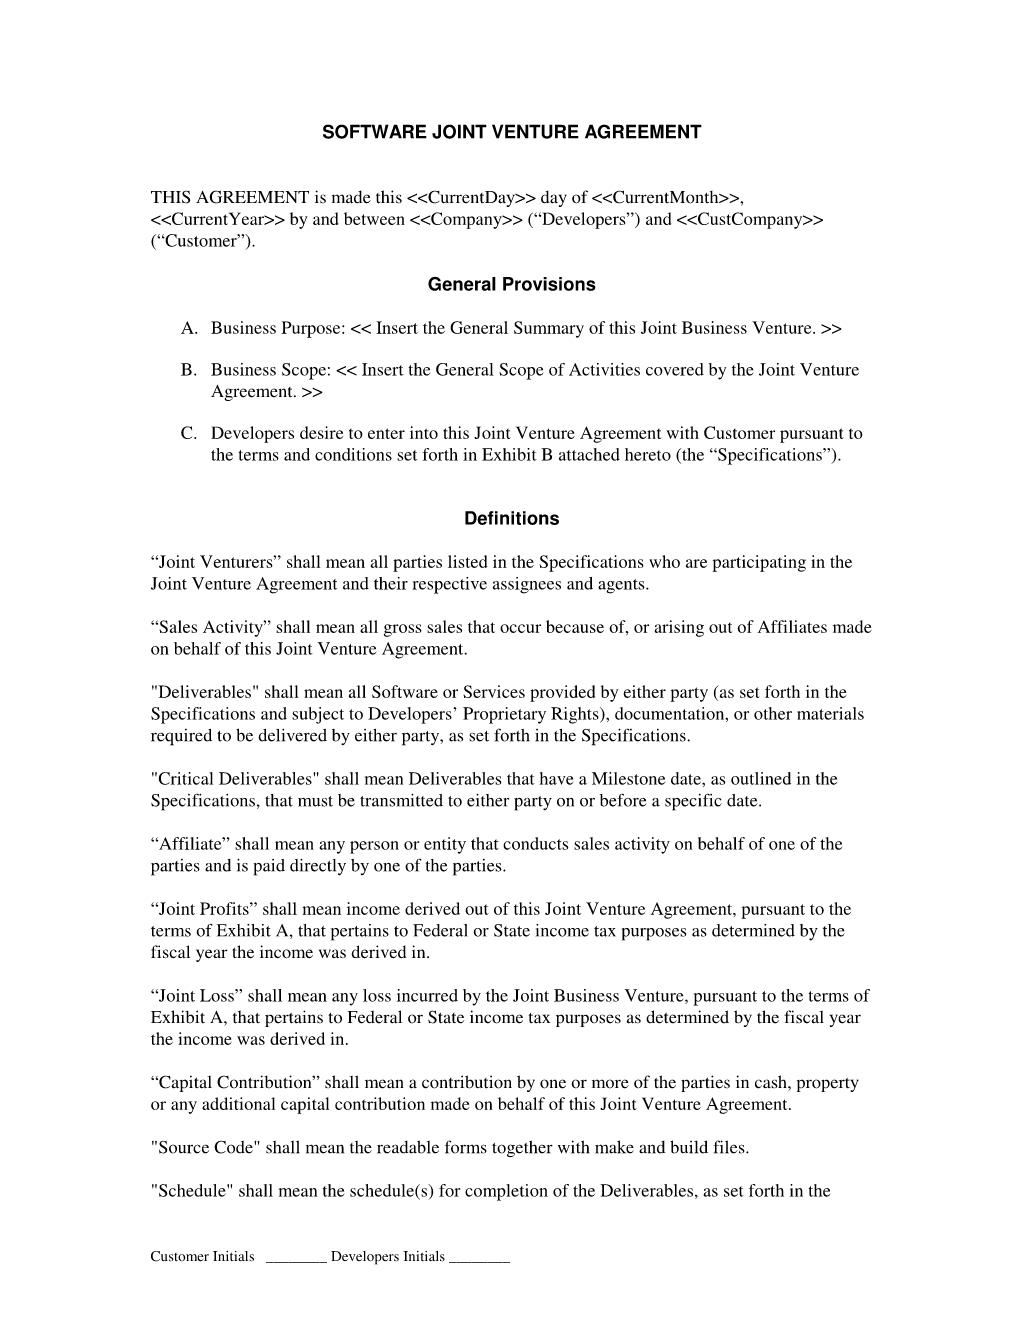 Joint Venture Agreement Templates  Agreement Sample Templates With Free Simple Joint Venture Agreement Template